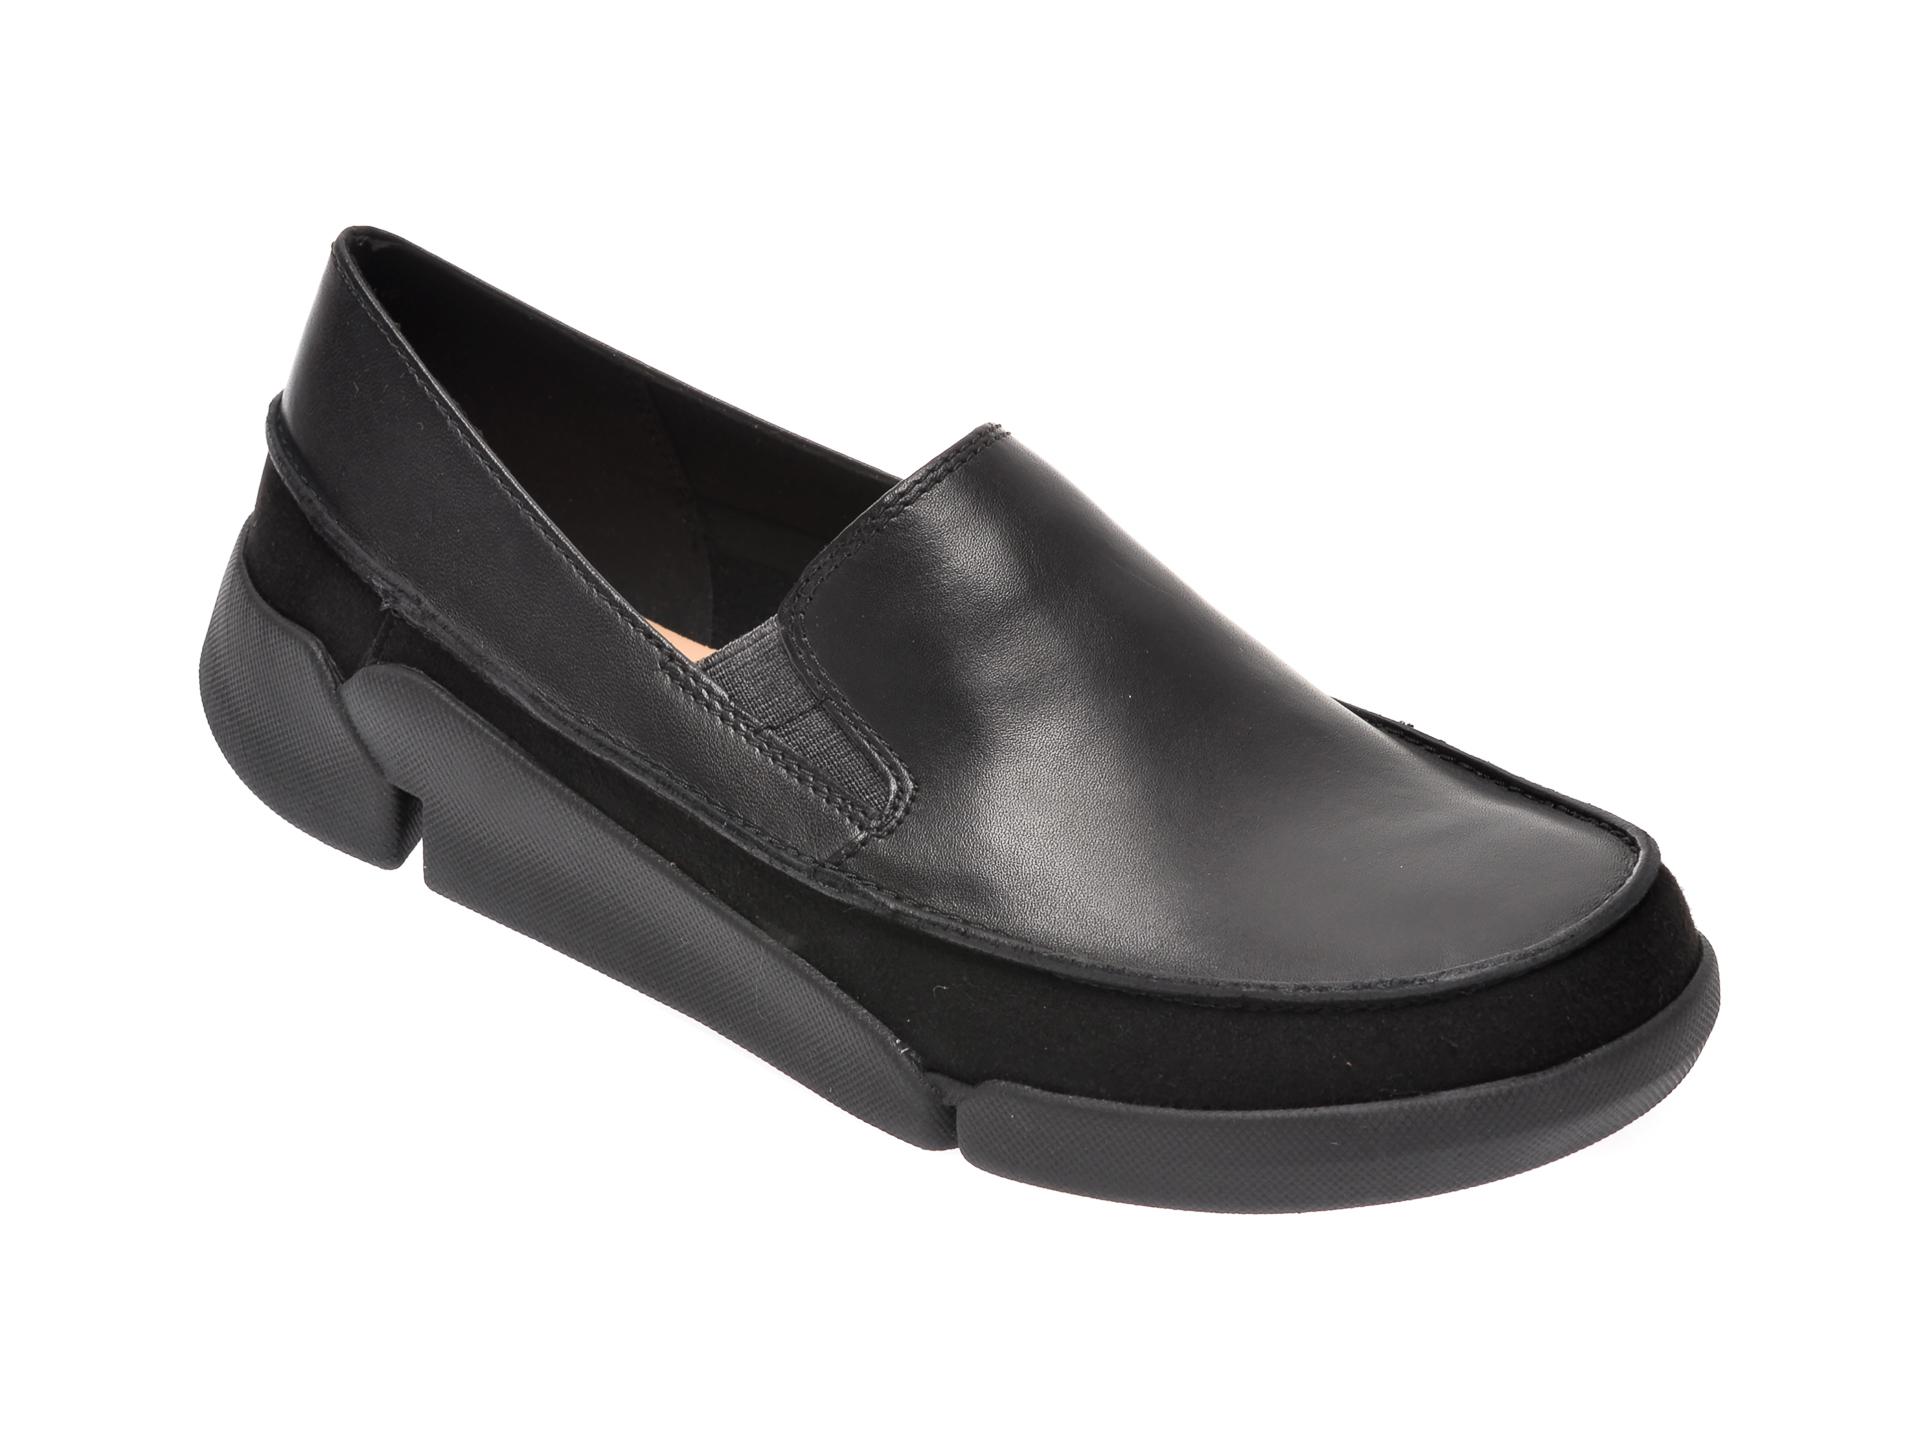 Pantofi CLARKS negri, Tri Step, din piele naturala